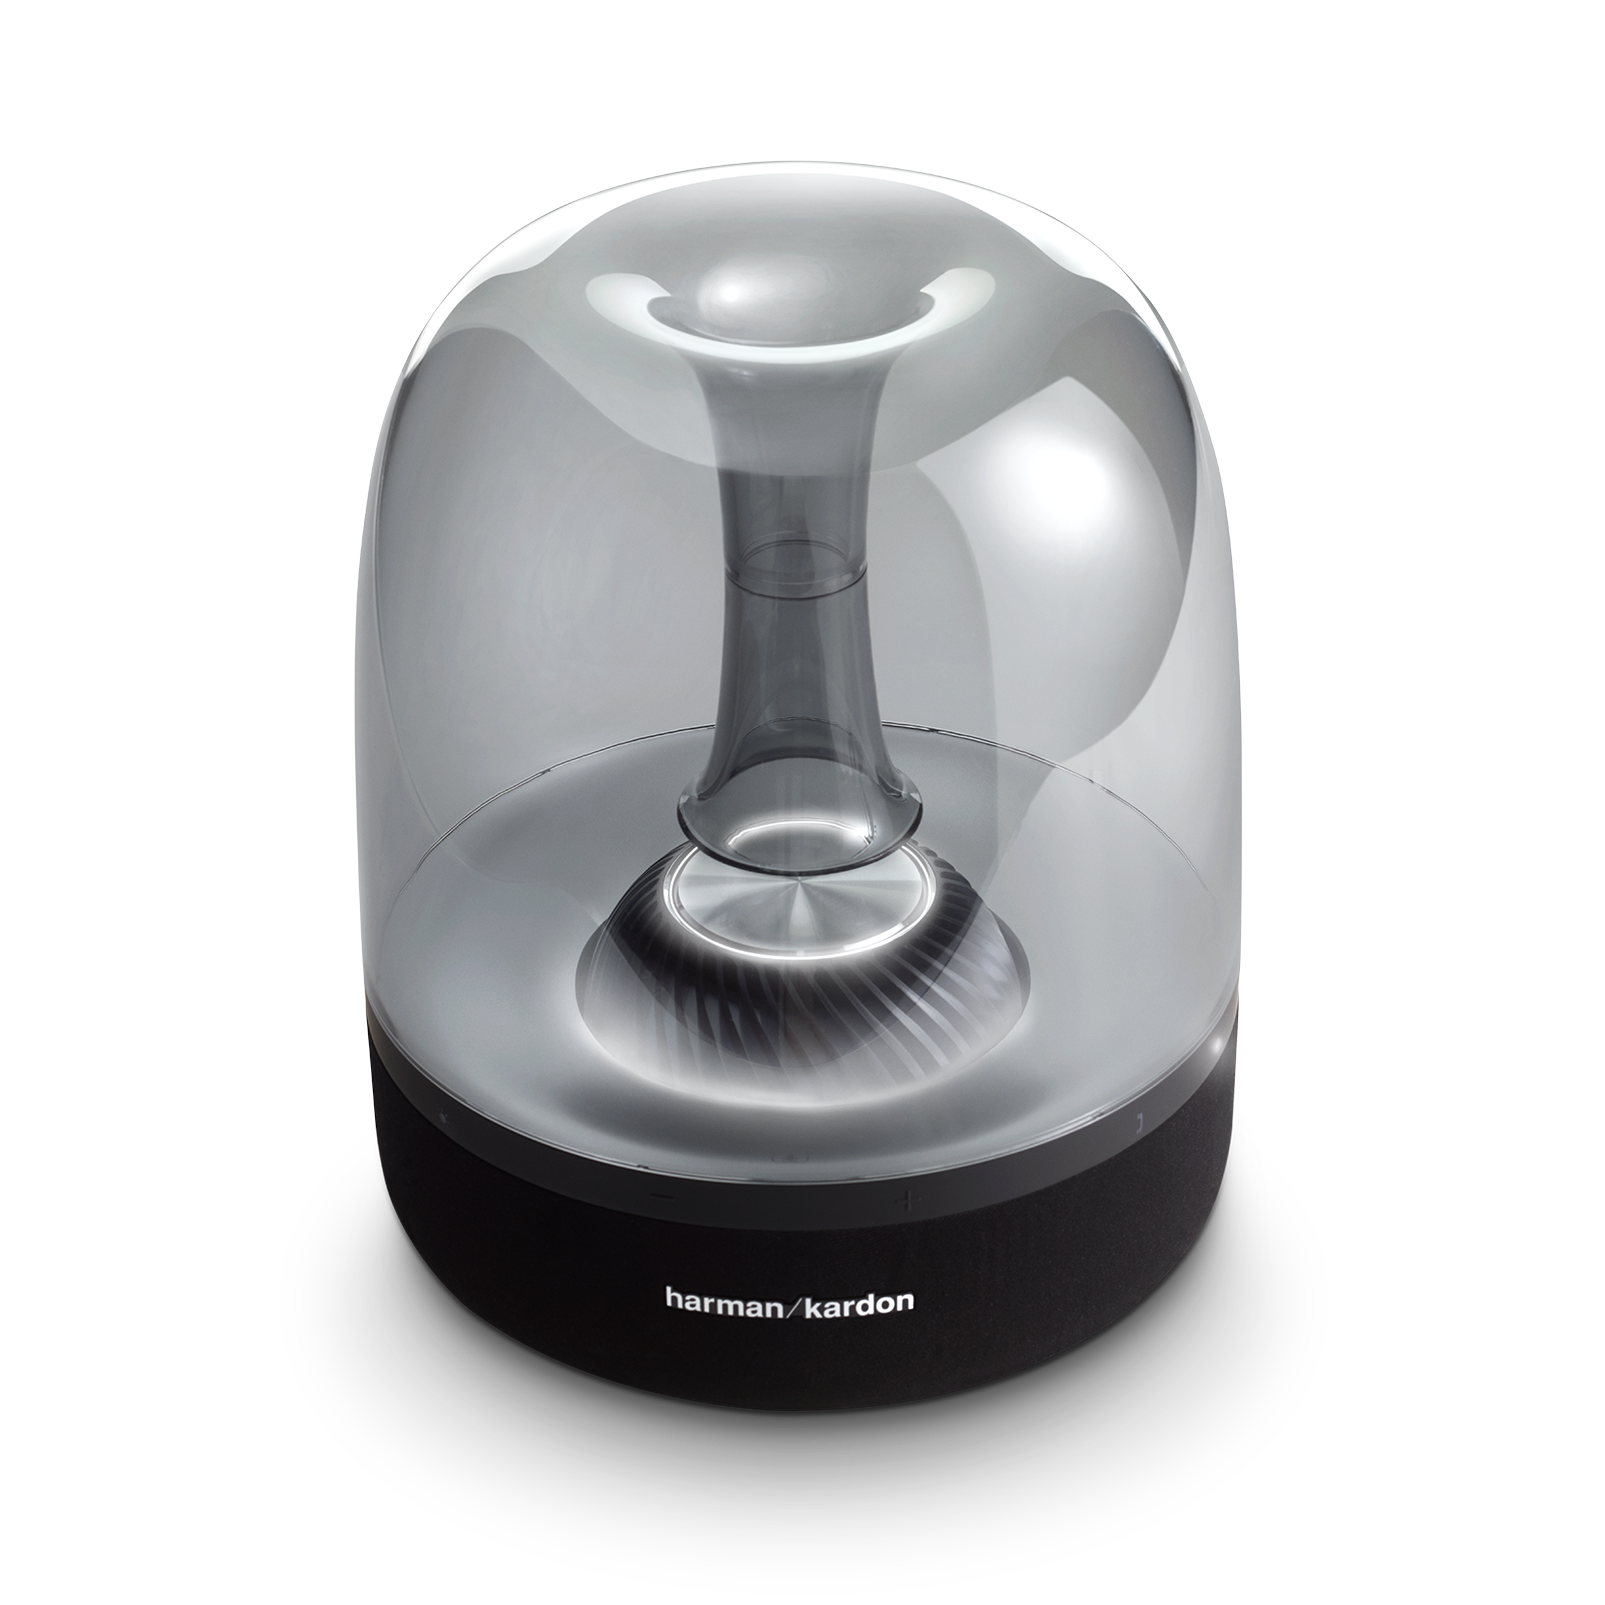 aura studio 2 wireless speaker with ambient lighting rh harmankardon co uk hk aura 2 manual hk aura user manual